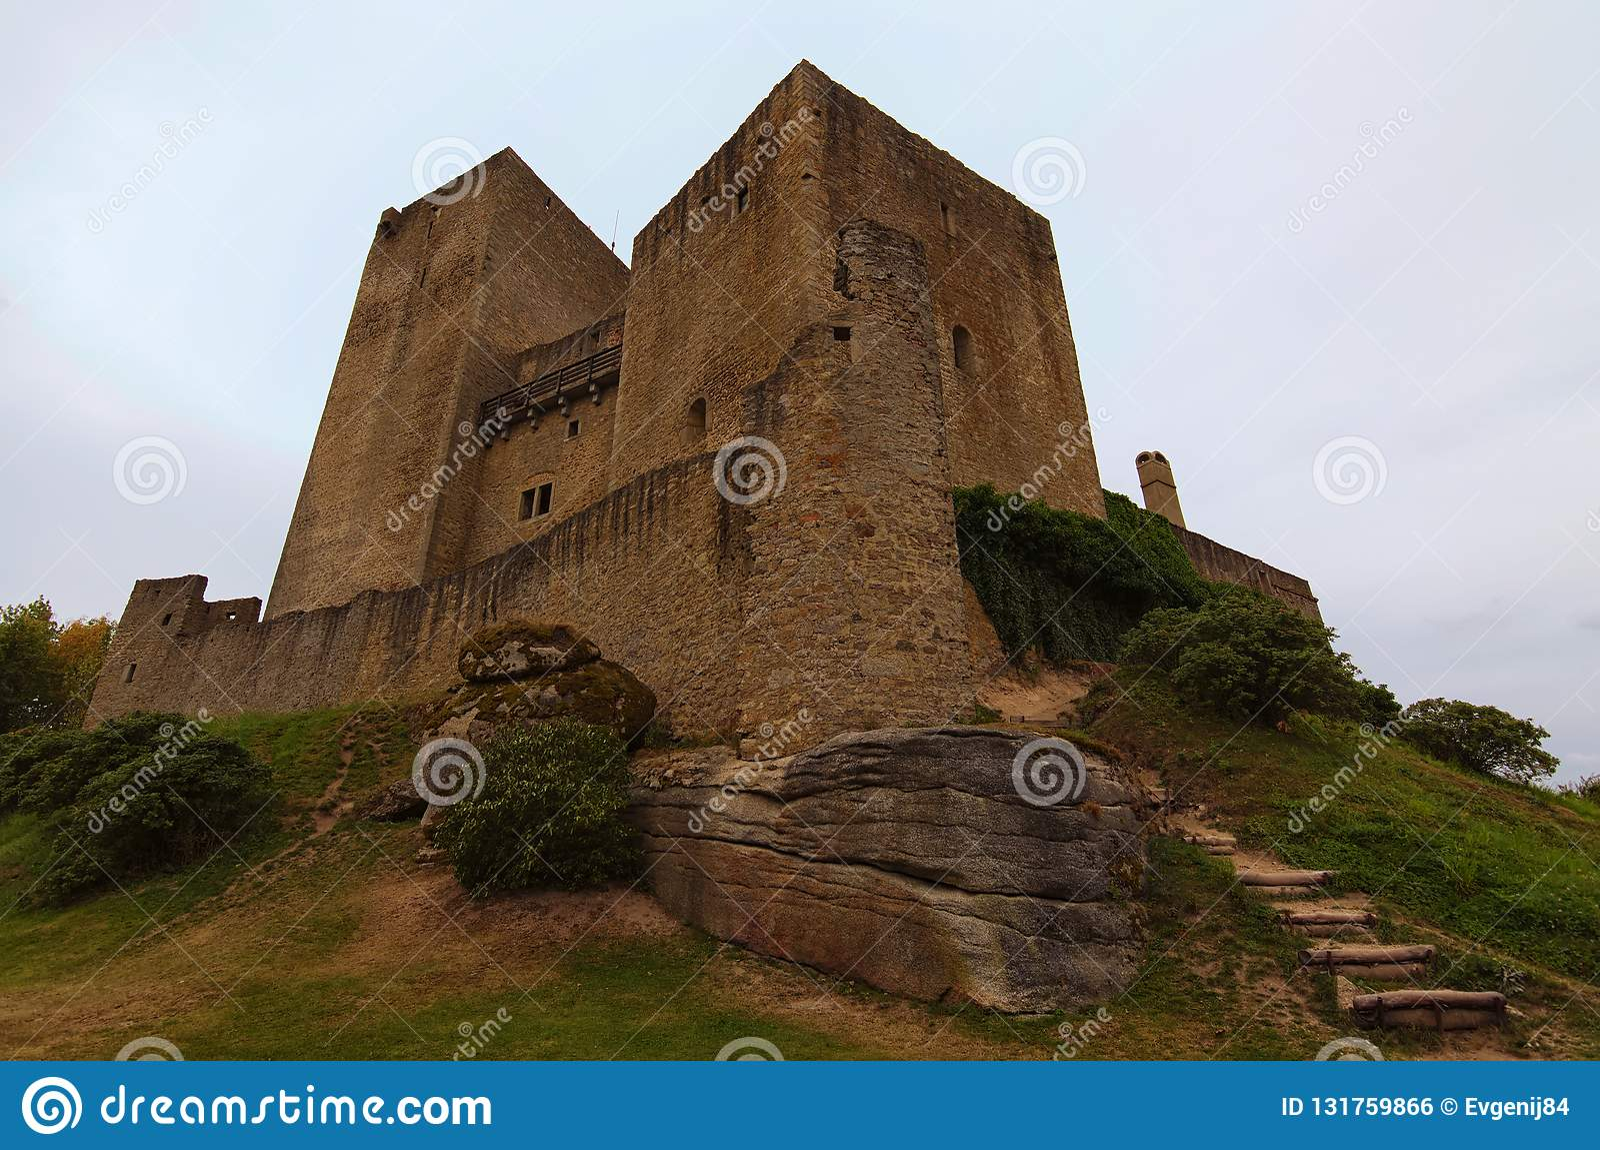 Klassieke brede hoekmening van middeleeuws Landstejn-Kasteel Het is het oudste en het best bewaarde Romaanse kasteel in Europa